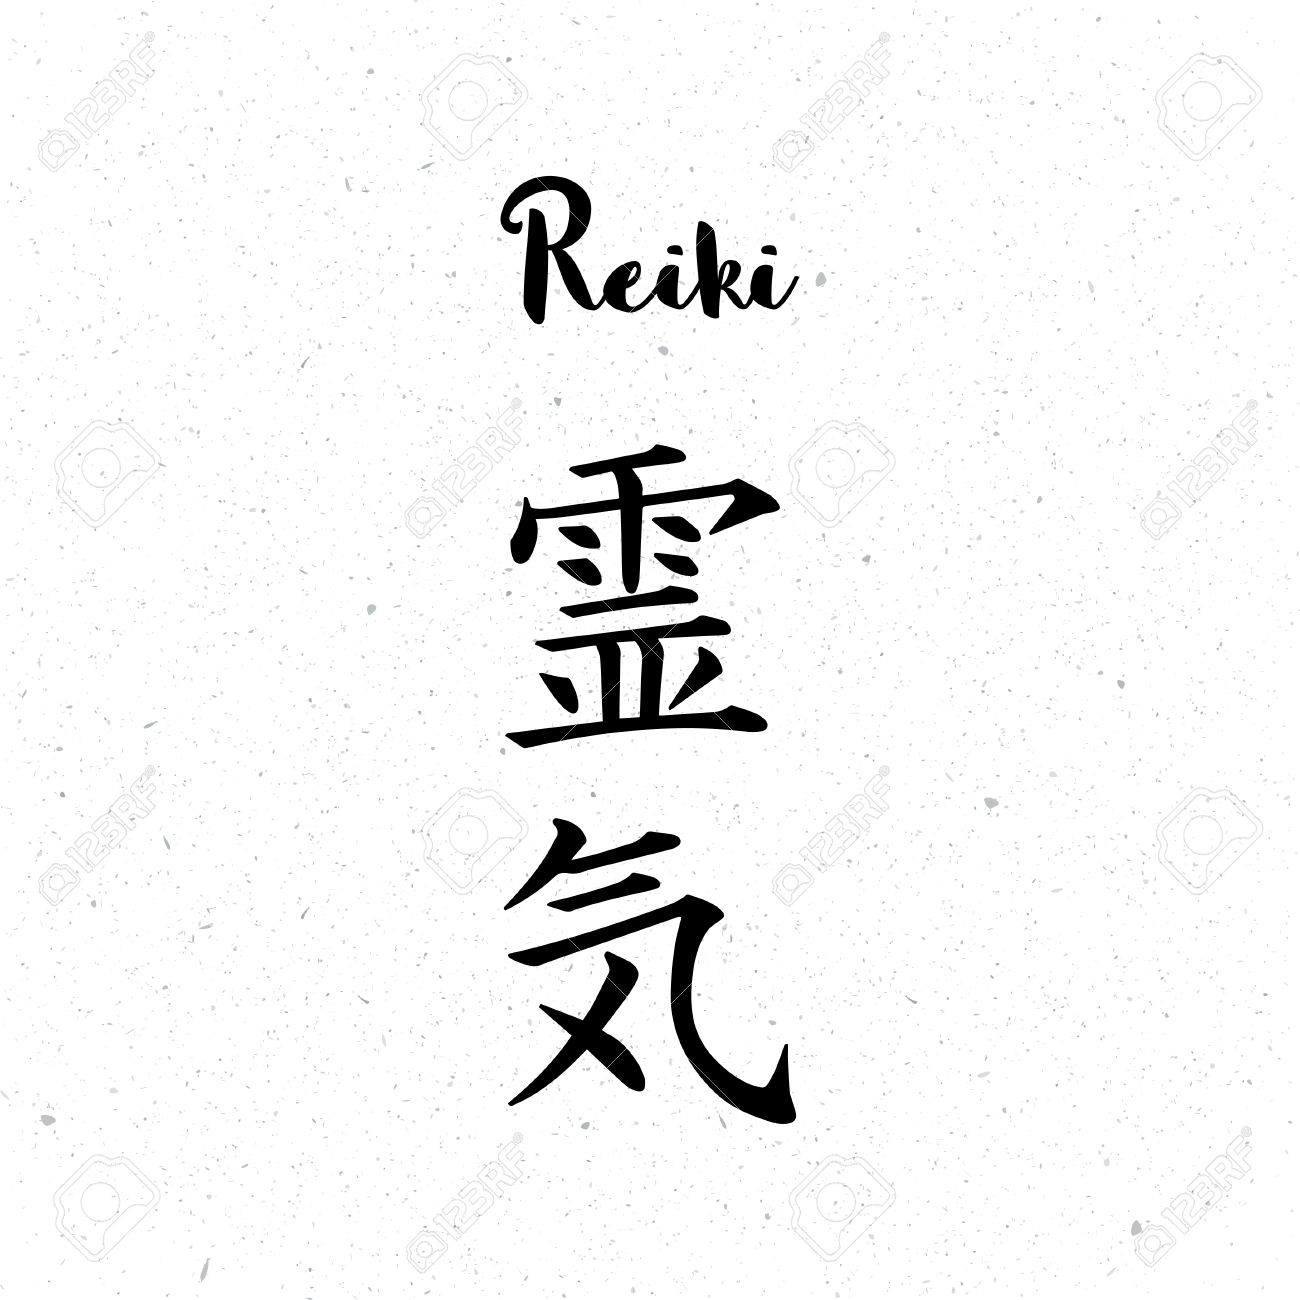 Sacred geometry reiki symbol the word reiki is made up of two sacred geometry reiki symbol the word reiki is made up of two japanese words biocorpaavc